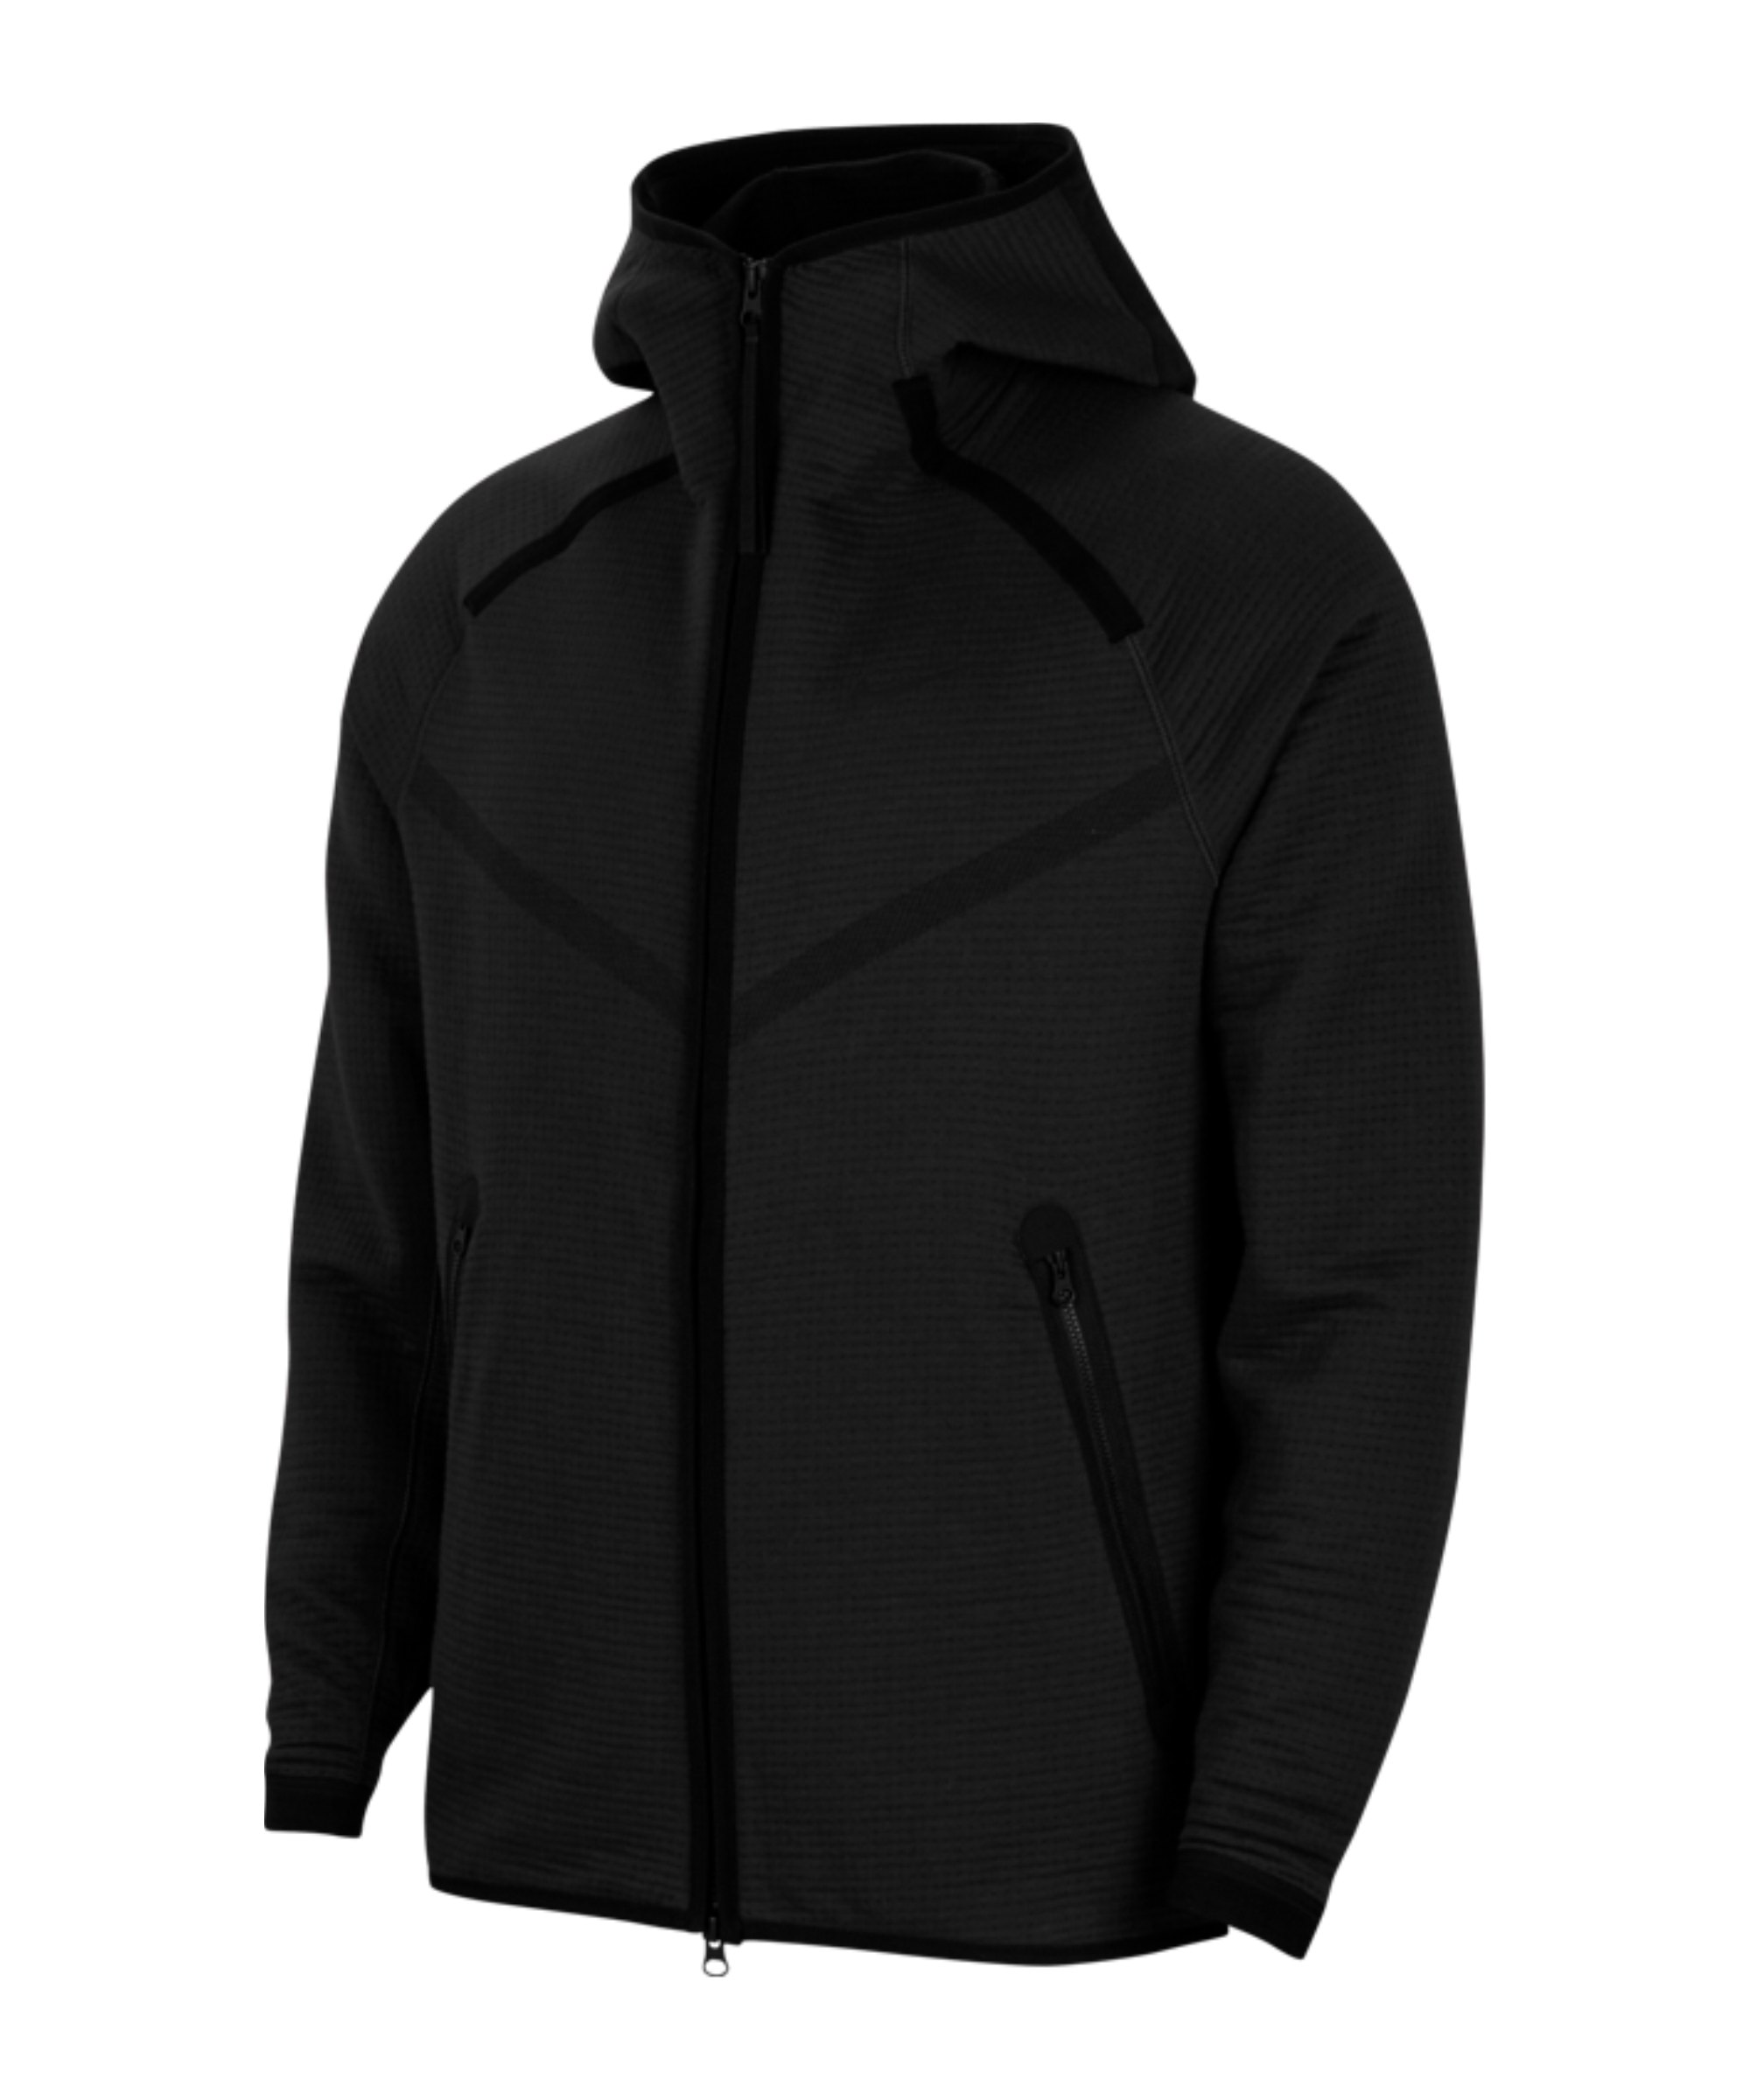 Nike Tech Pack Windrunner Kapuzenjacke F010 - schwarz